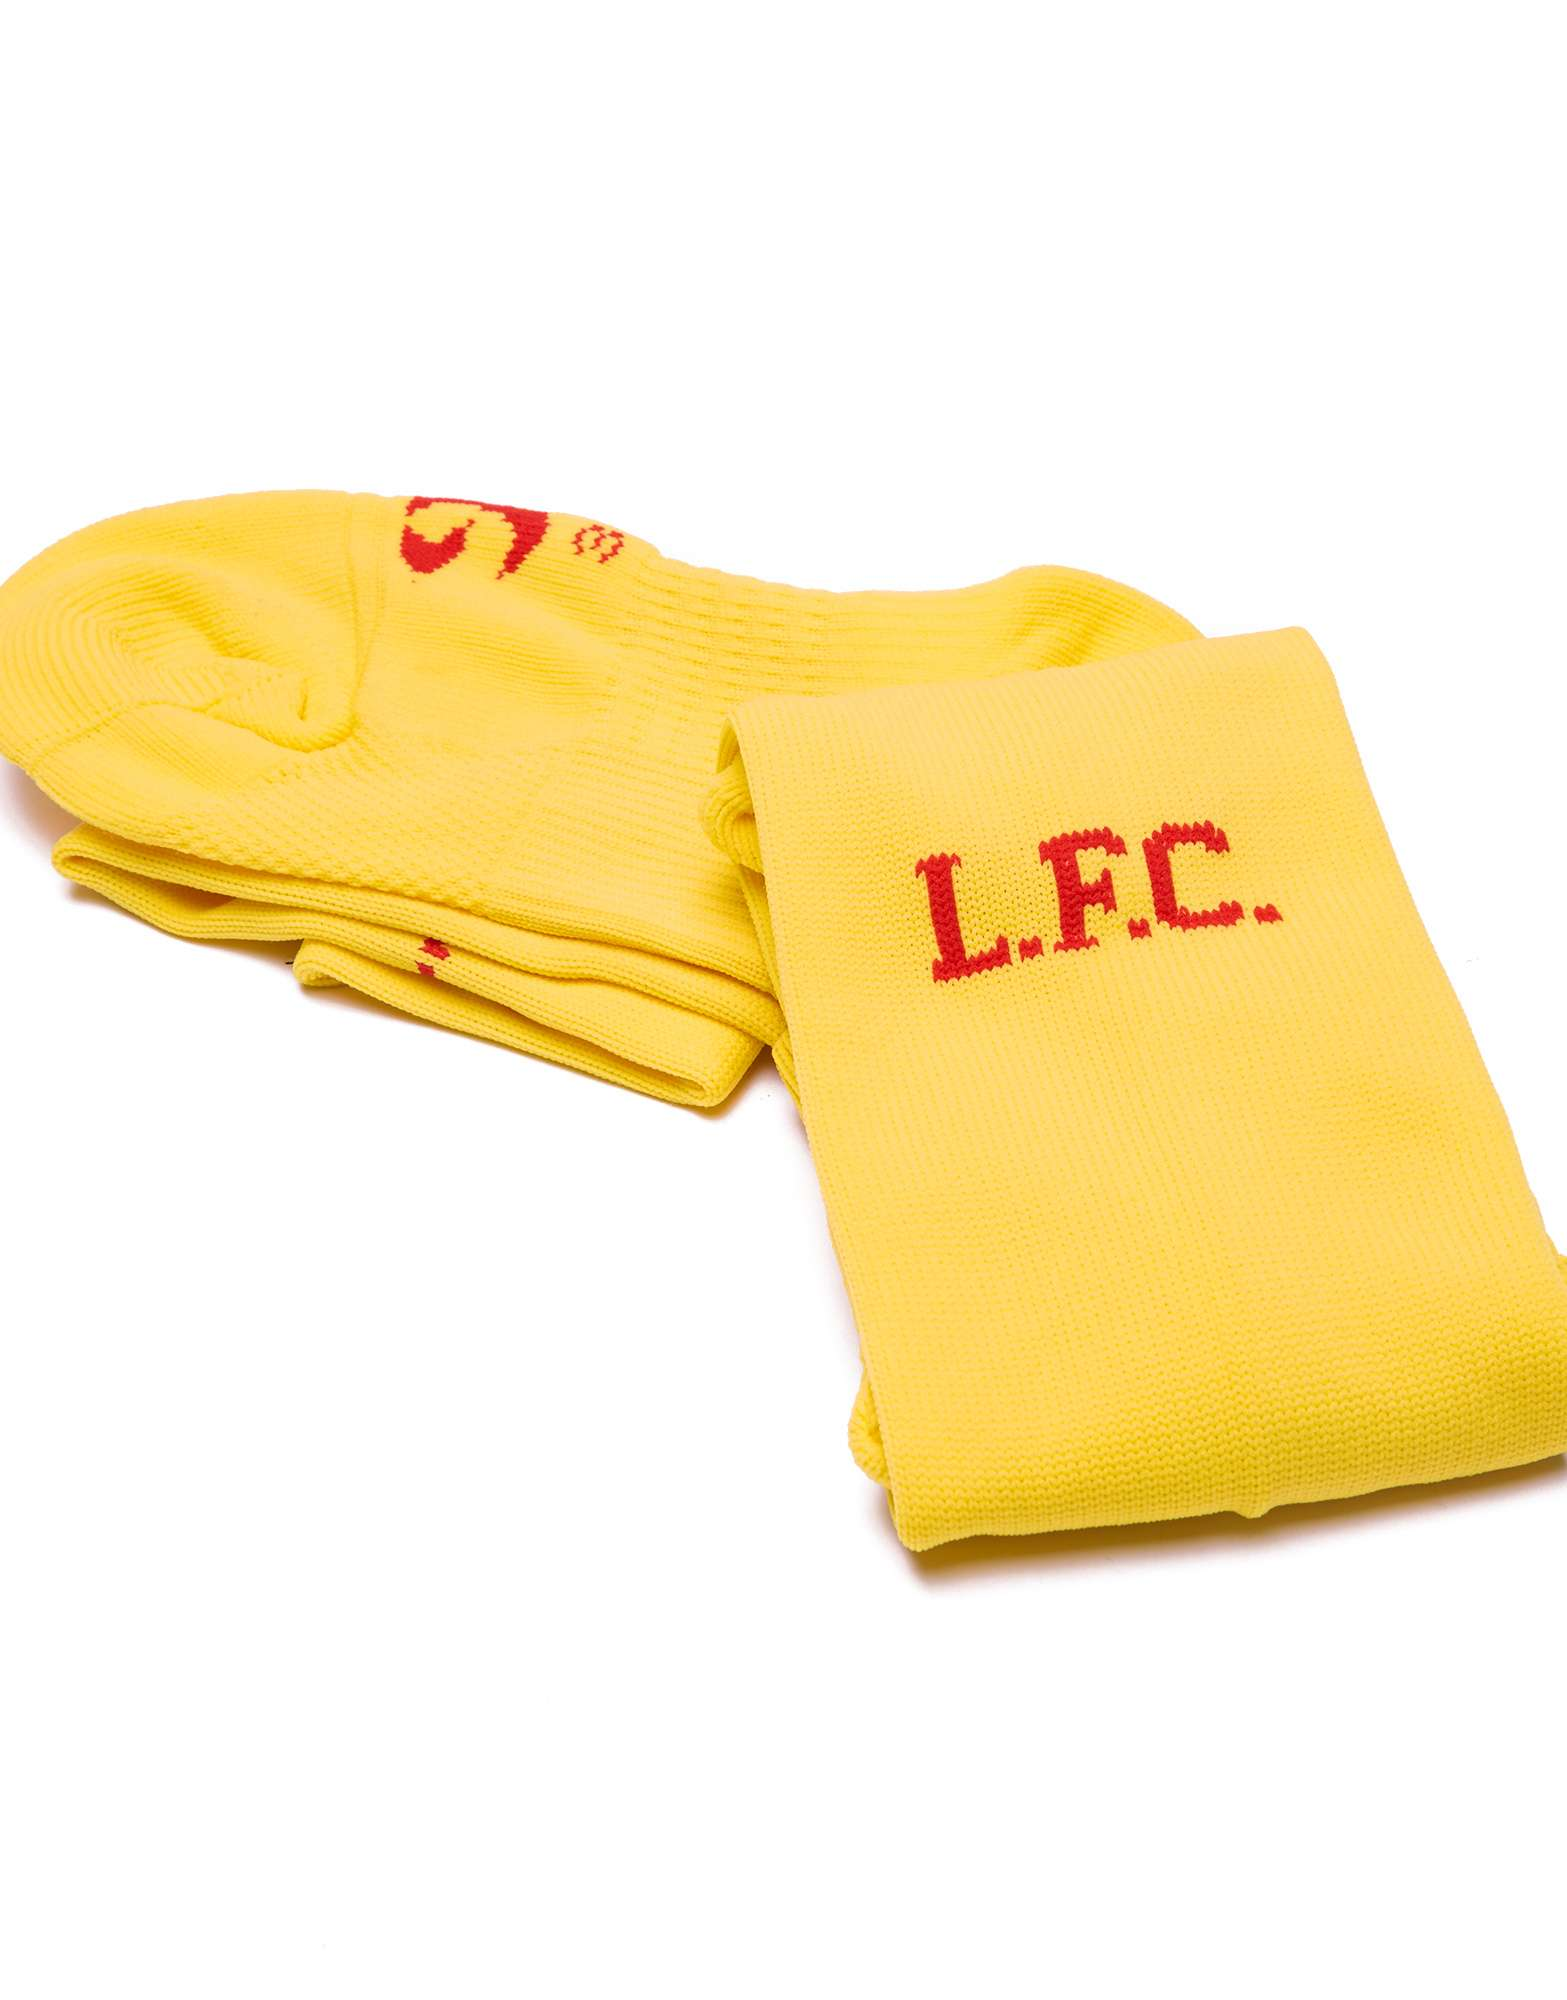 Warrior Sports Liverpool 2014 Away Socks